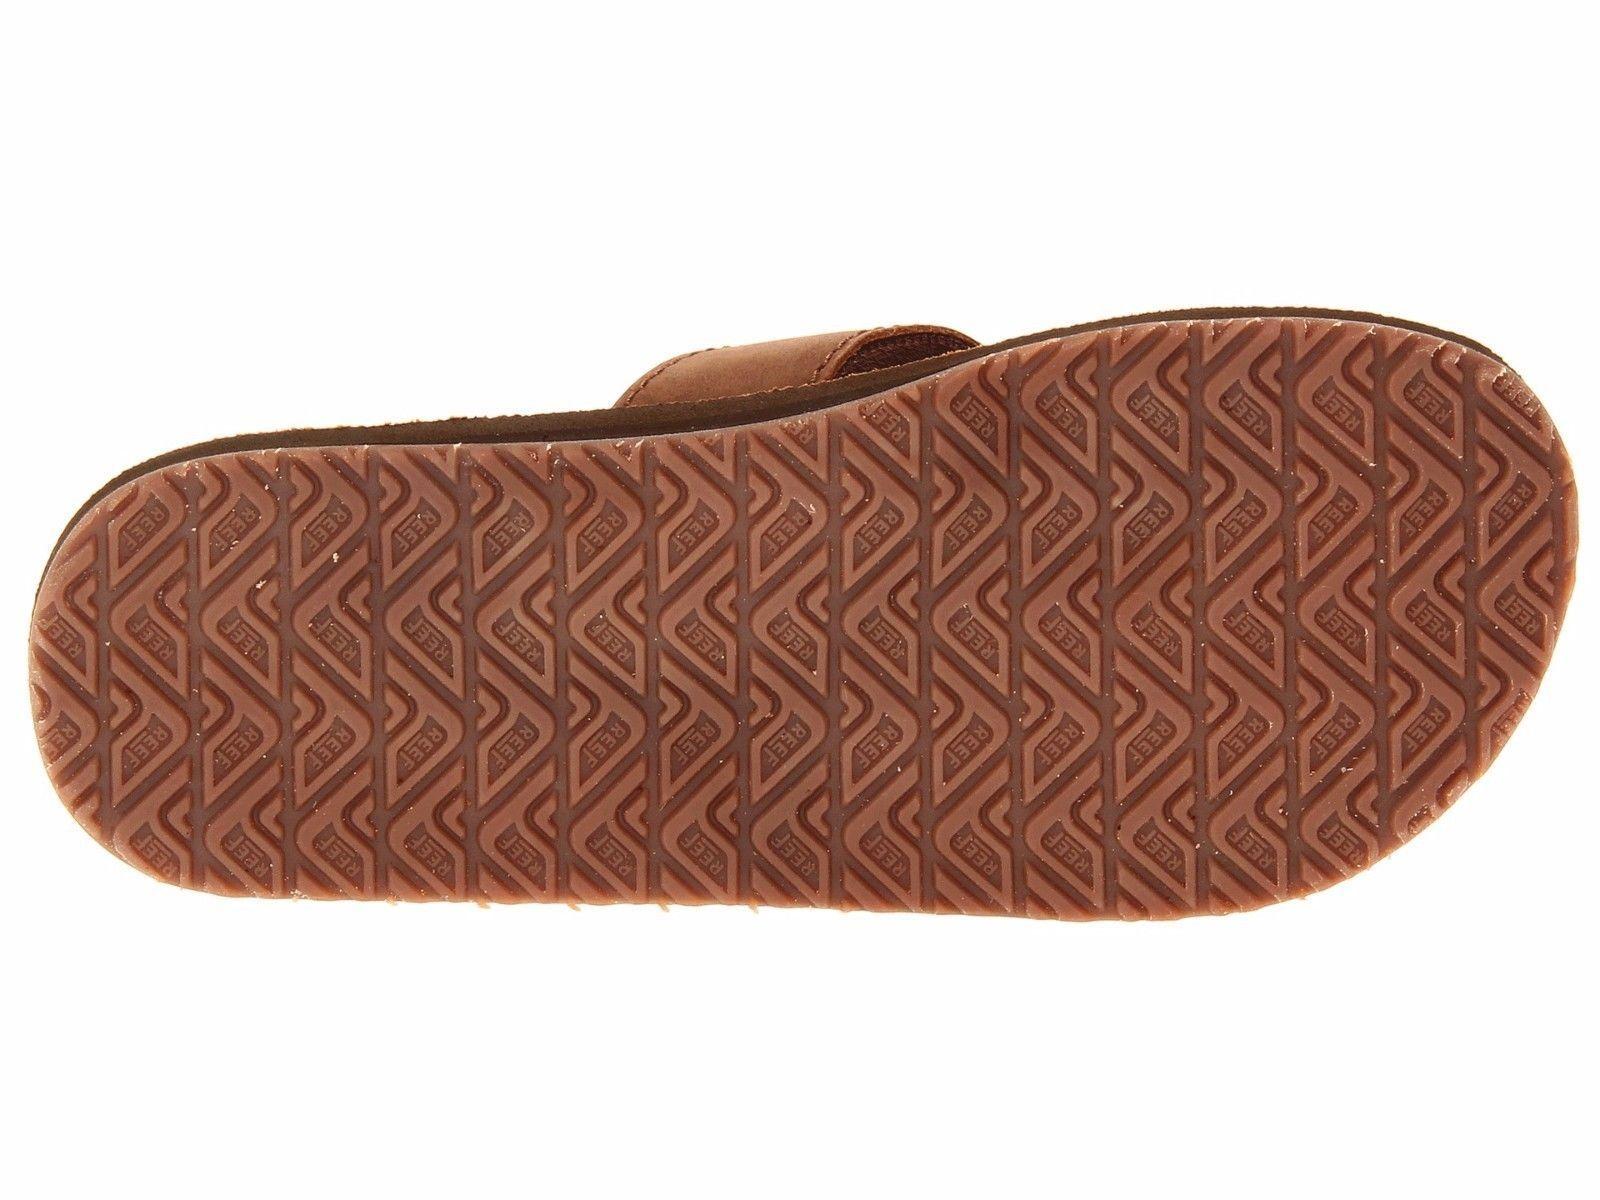 Reef Reef Reef Uomo Sandali di Cuoio Smoothy Bronzo Classico Marronee RF000232 100% | Più economico del prezzo  | Sig/Sig Ra Scarpa  1afcfa